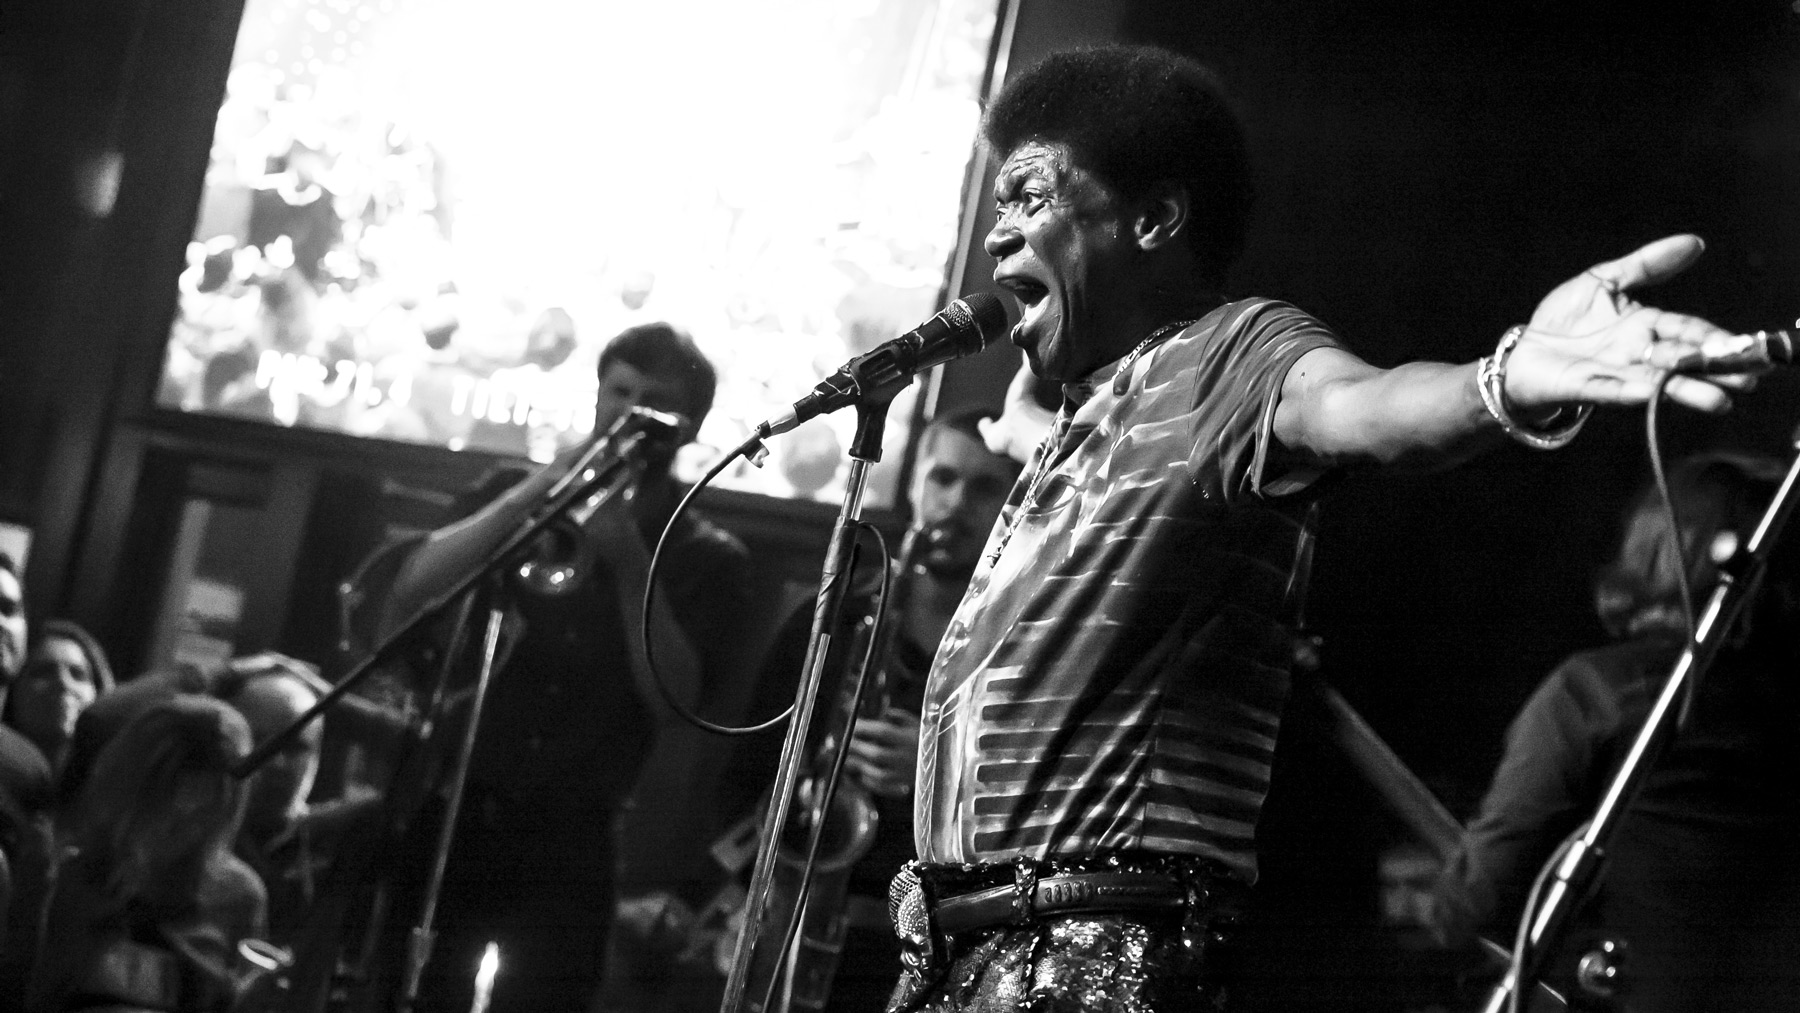 5K1A0081-charles-bradley-bluescafe-hero